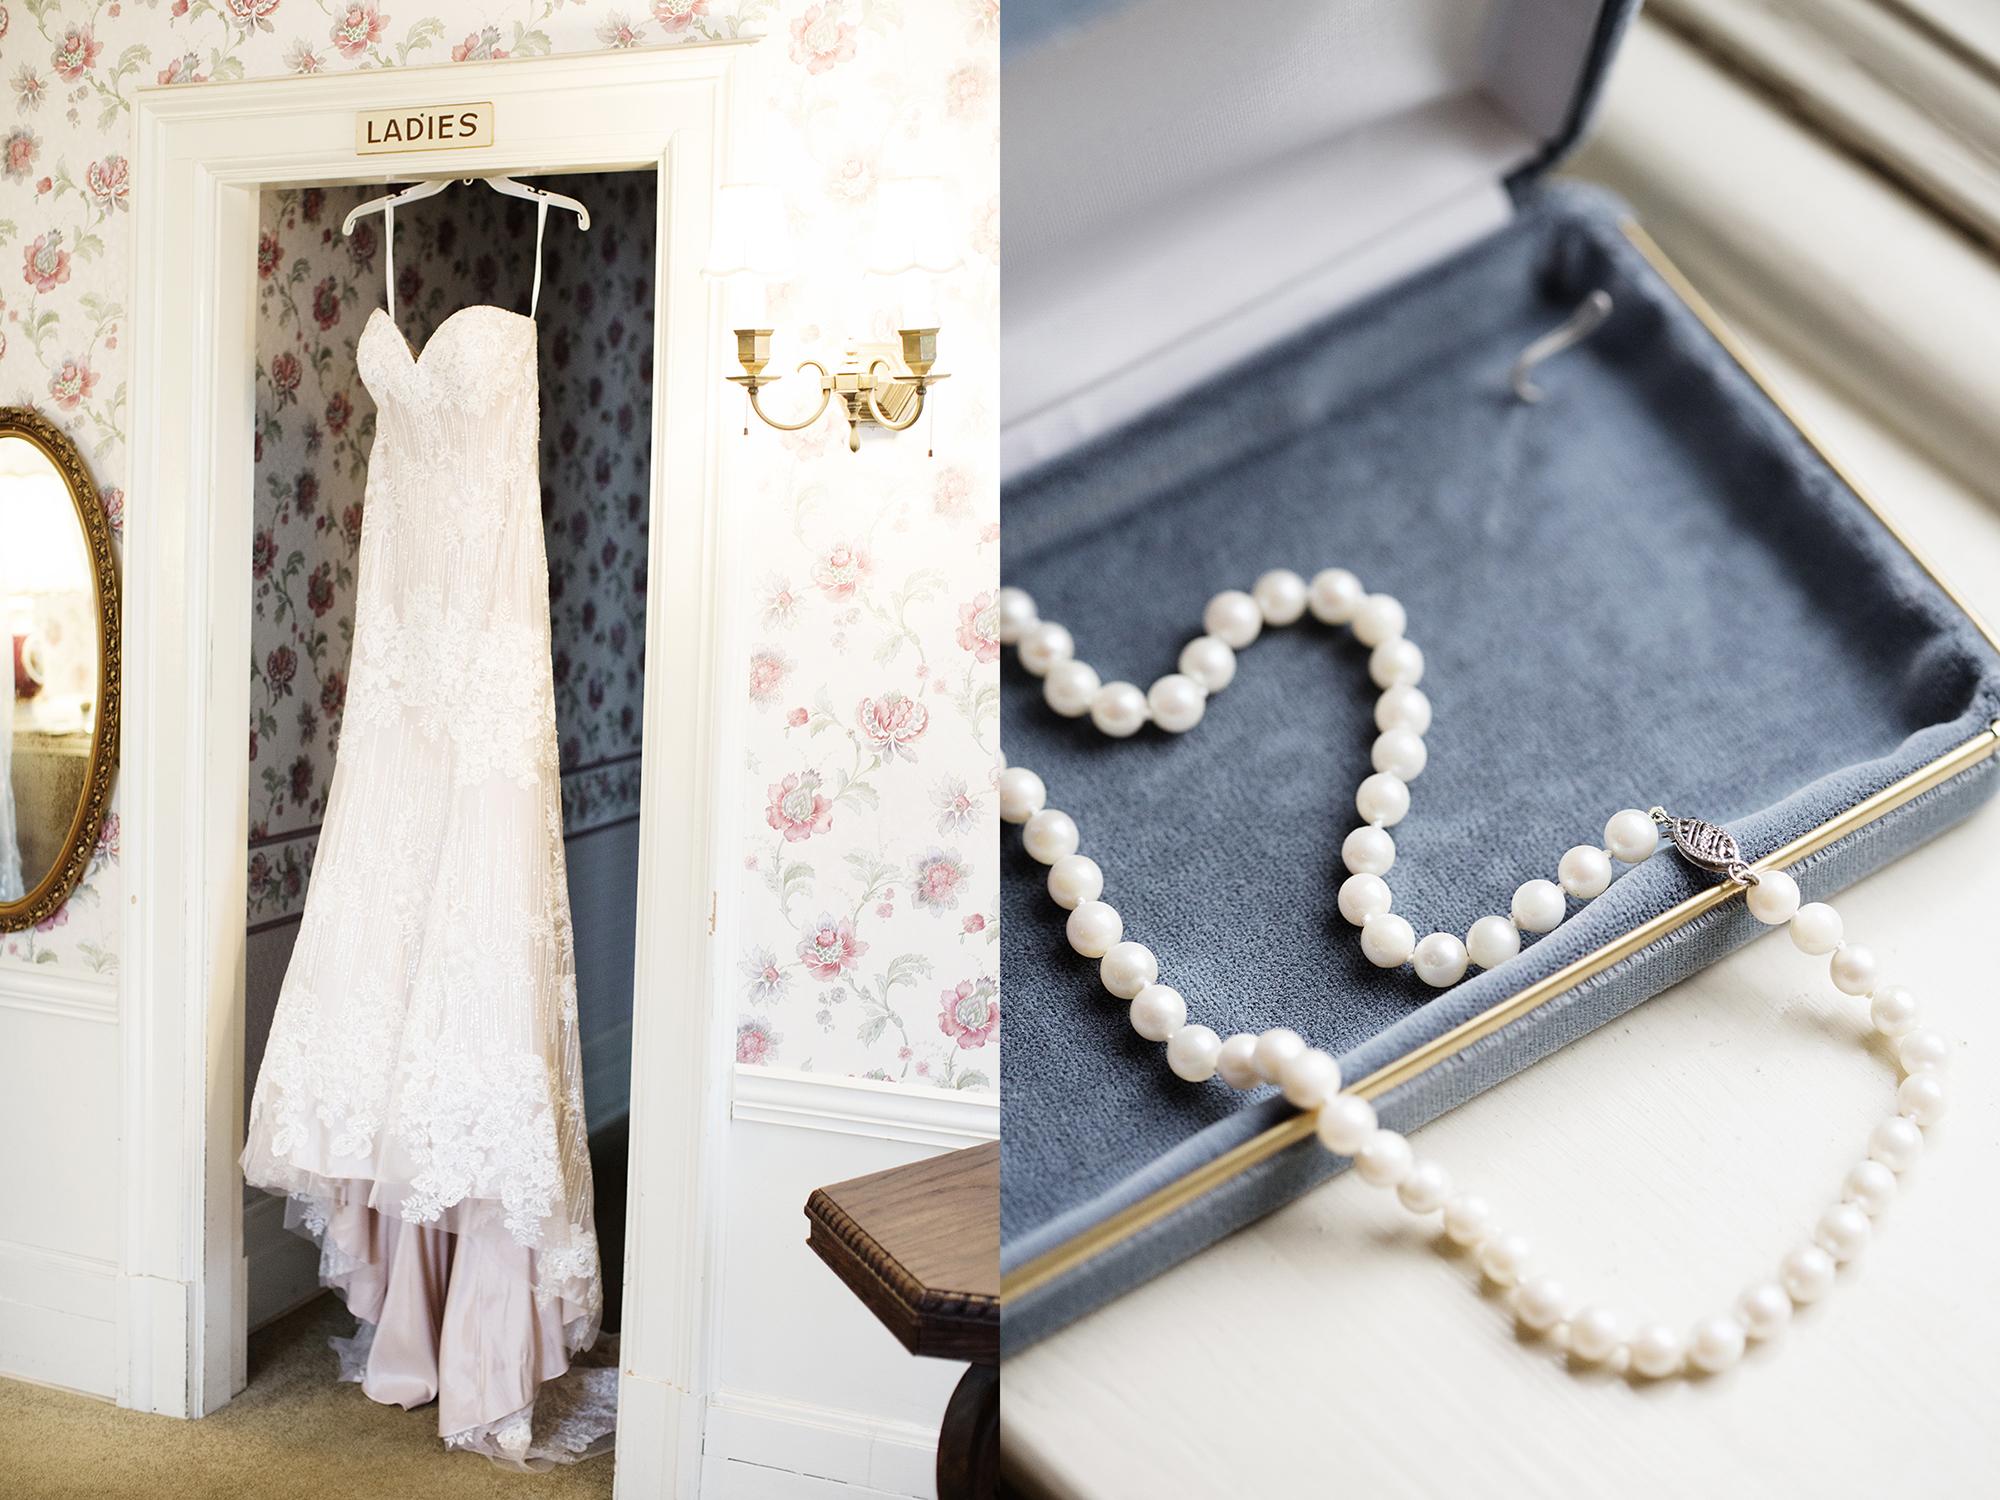 Wedding Photographers MN | Photography by Photogen Inc. | Eliesa Johnson | Based in Minneapolis, Minnesota